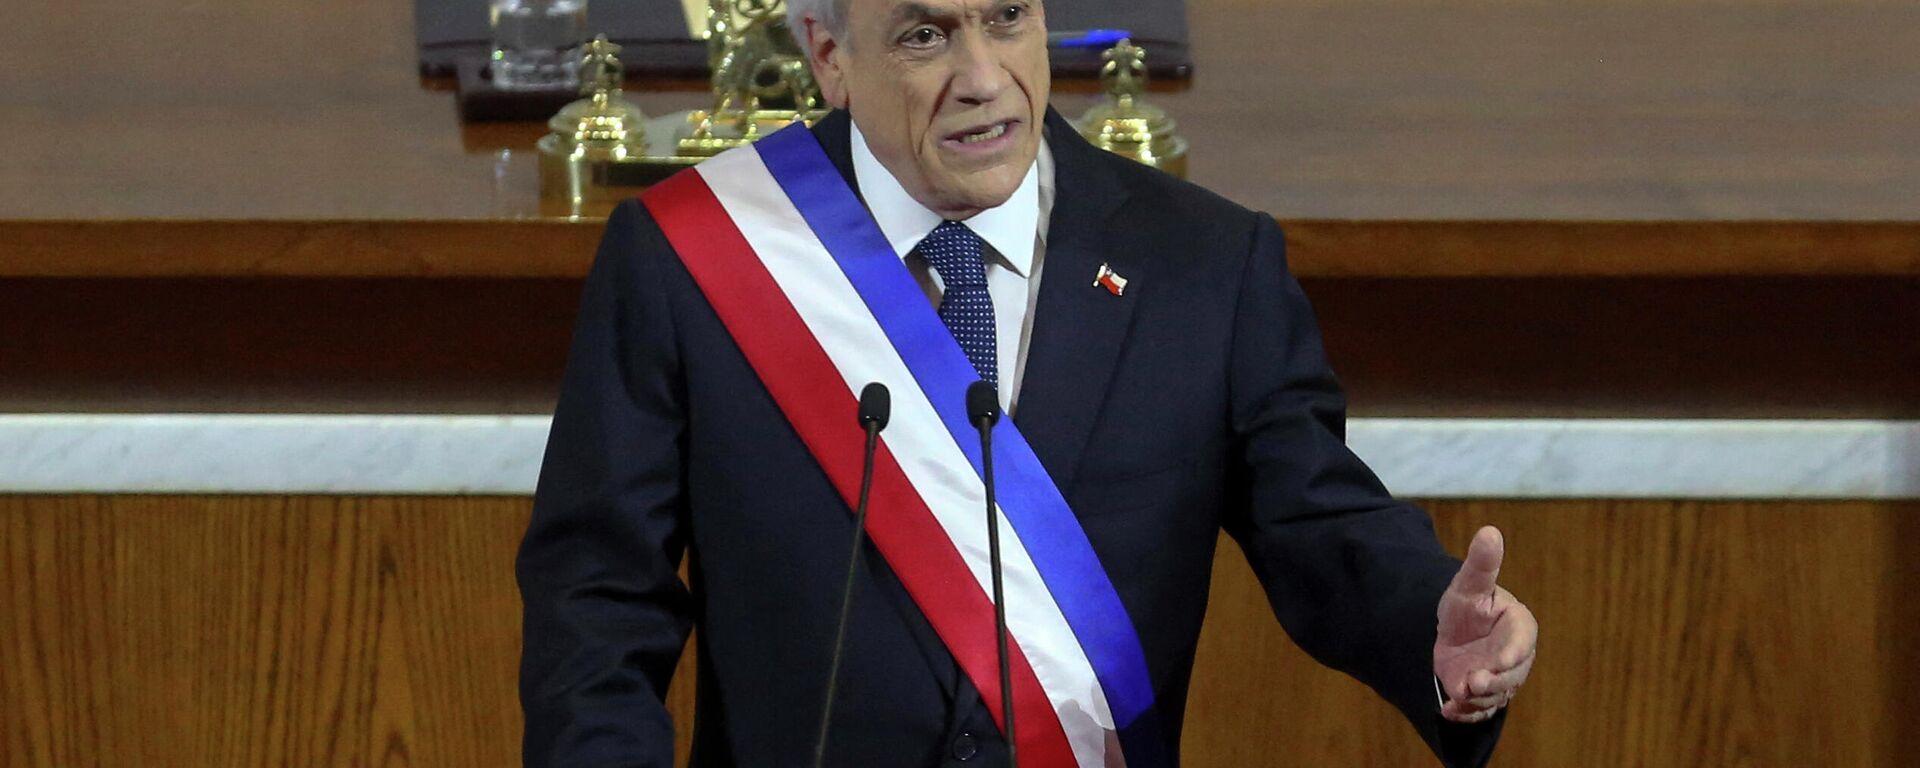 Sebastián Piñera, presidente de Chile - Sputnik Mundo, 1920, 19.07.2021